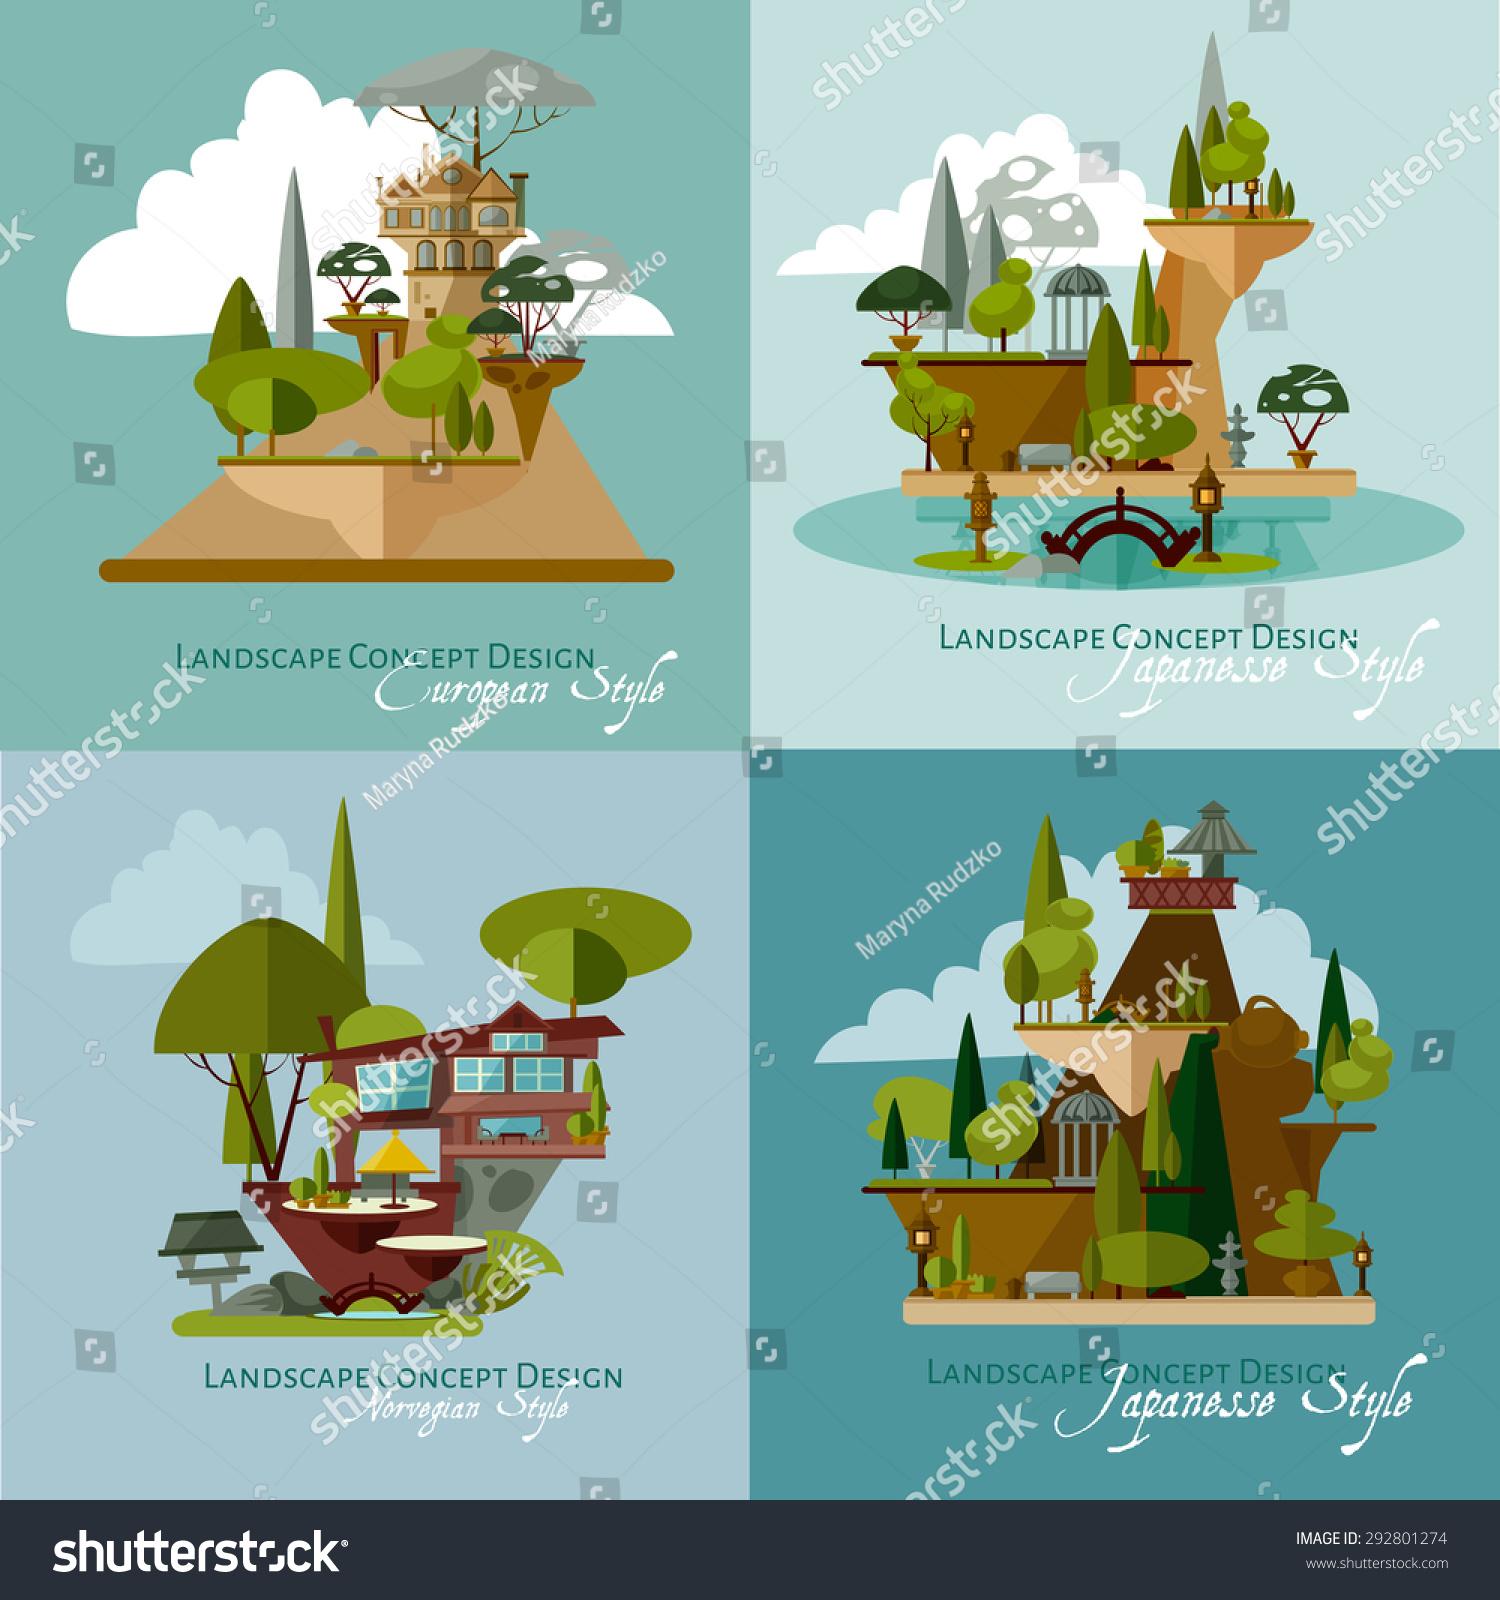 Vector Landscape Design Flat Concept Illustrations Stock Vector